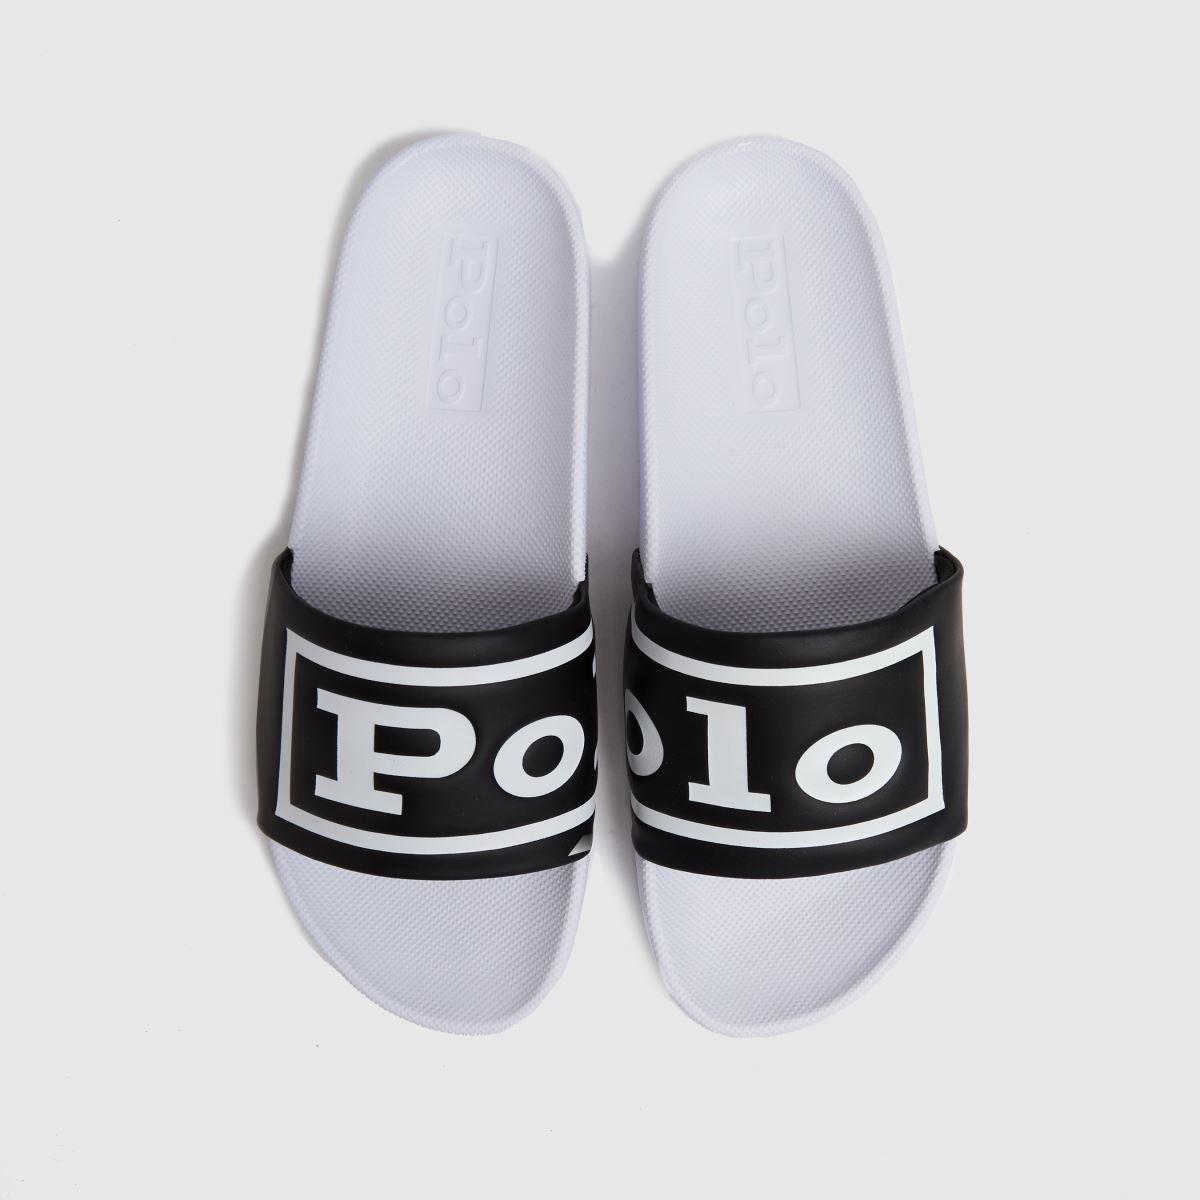 Polo Ralph Lauren White & Black Cayson Slide Sandals